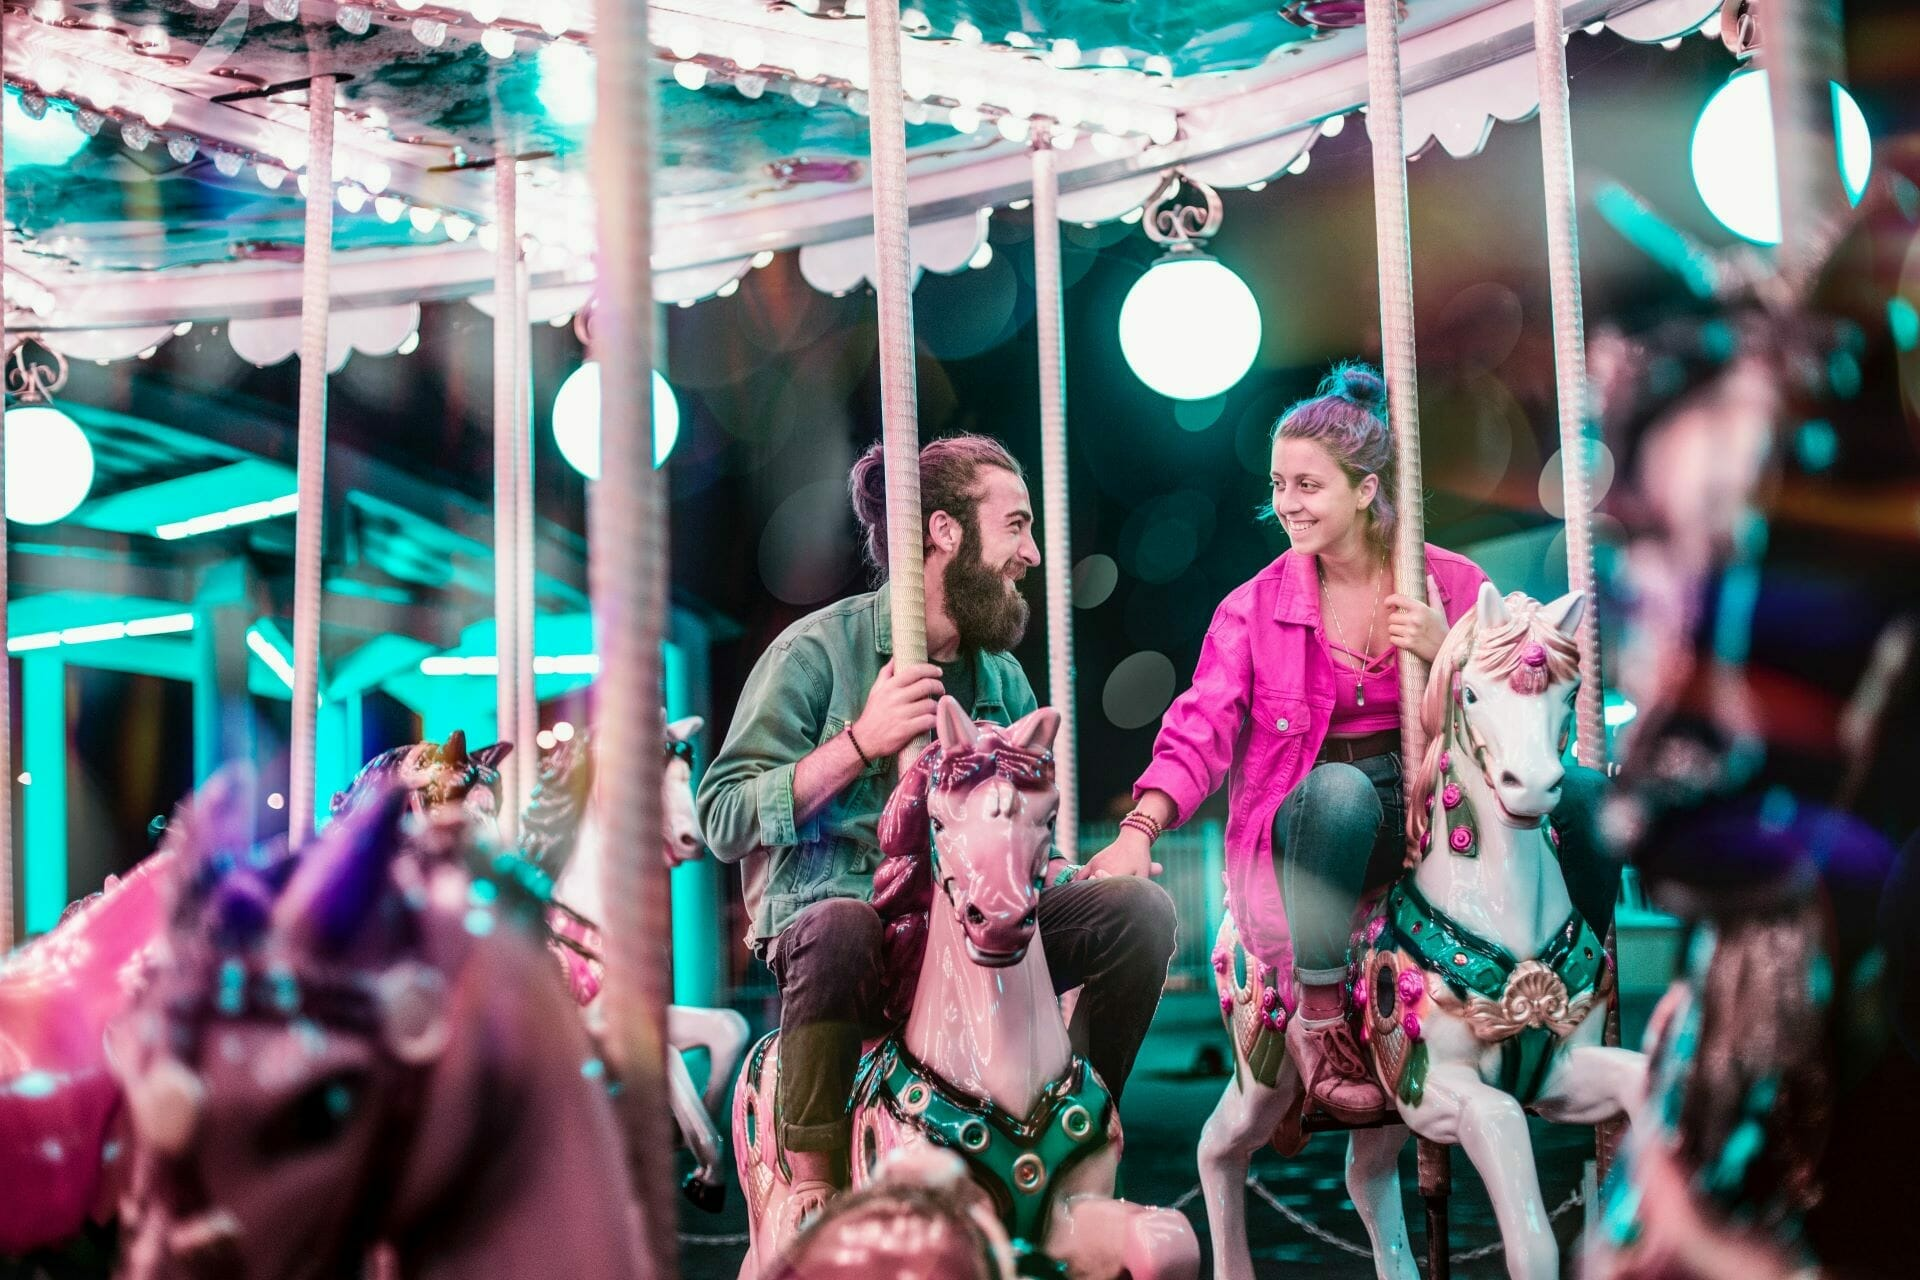 9 Best Hobbies for Couples to Strengthen Your Bond via @allamericanatlas